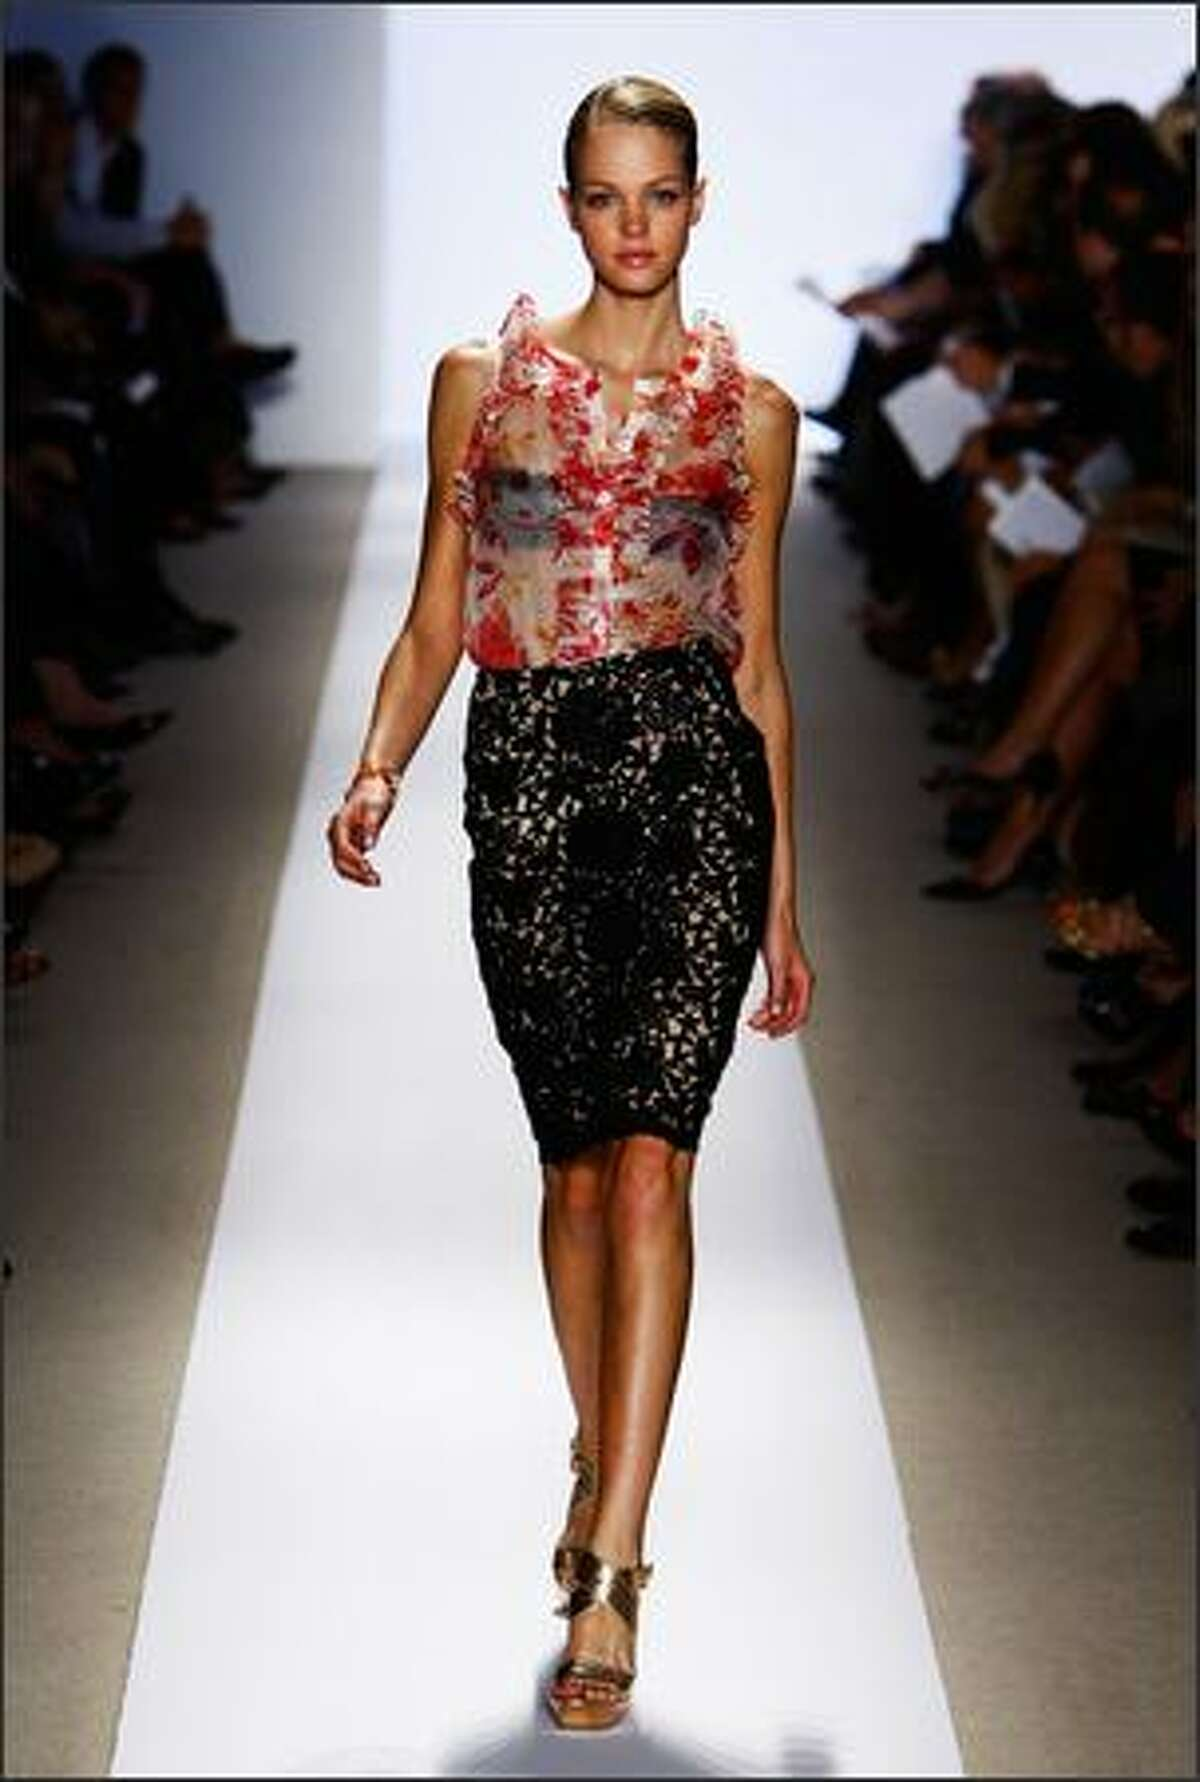 A model walks the runway at the Badgley Mischka show.